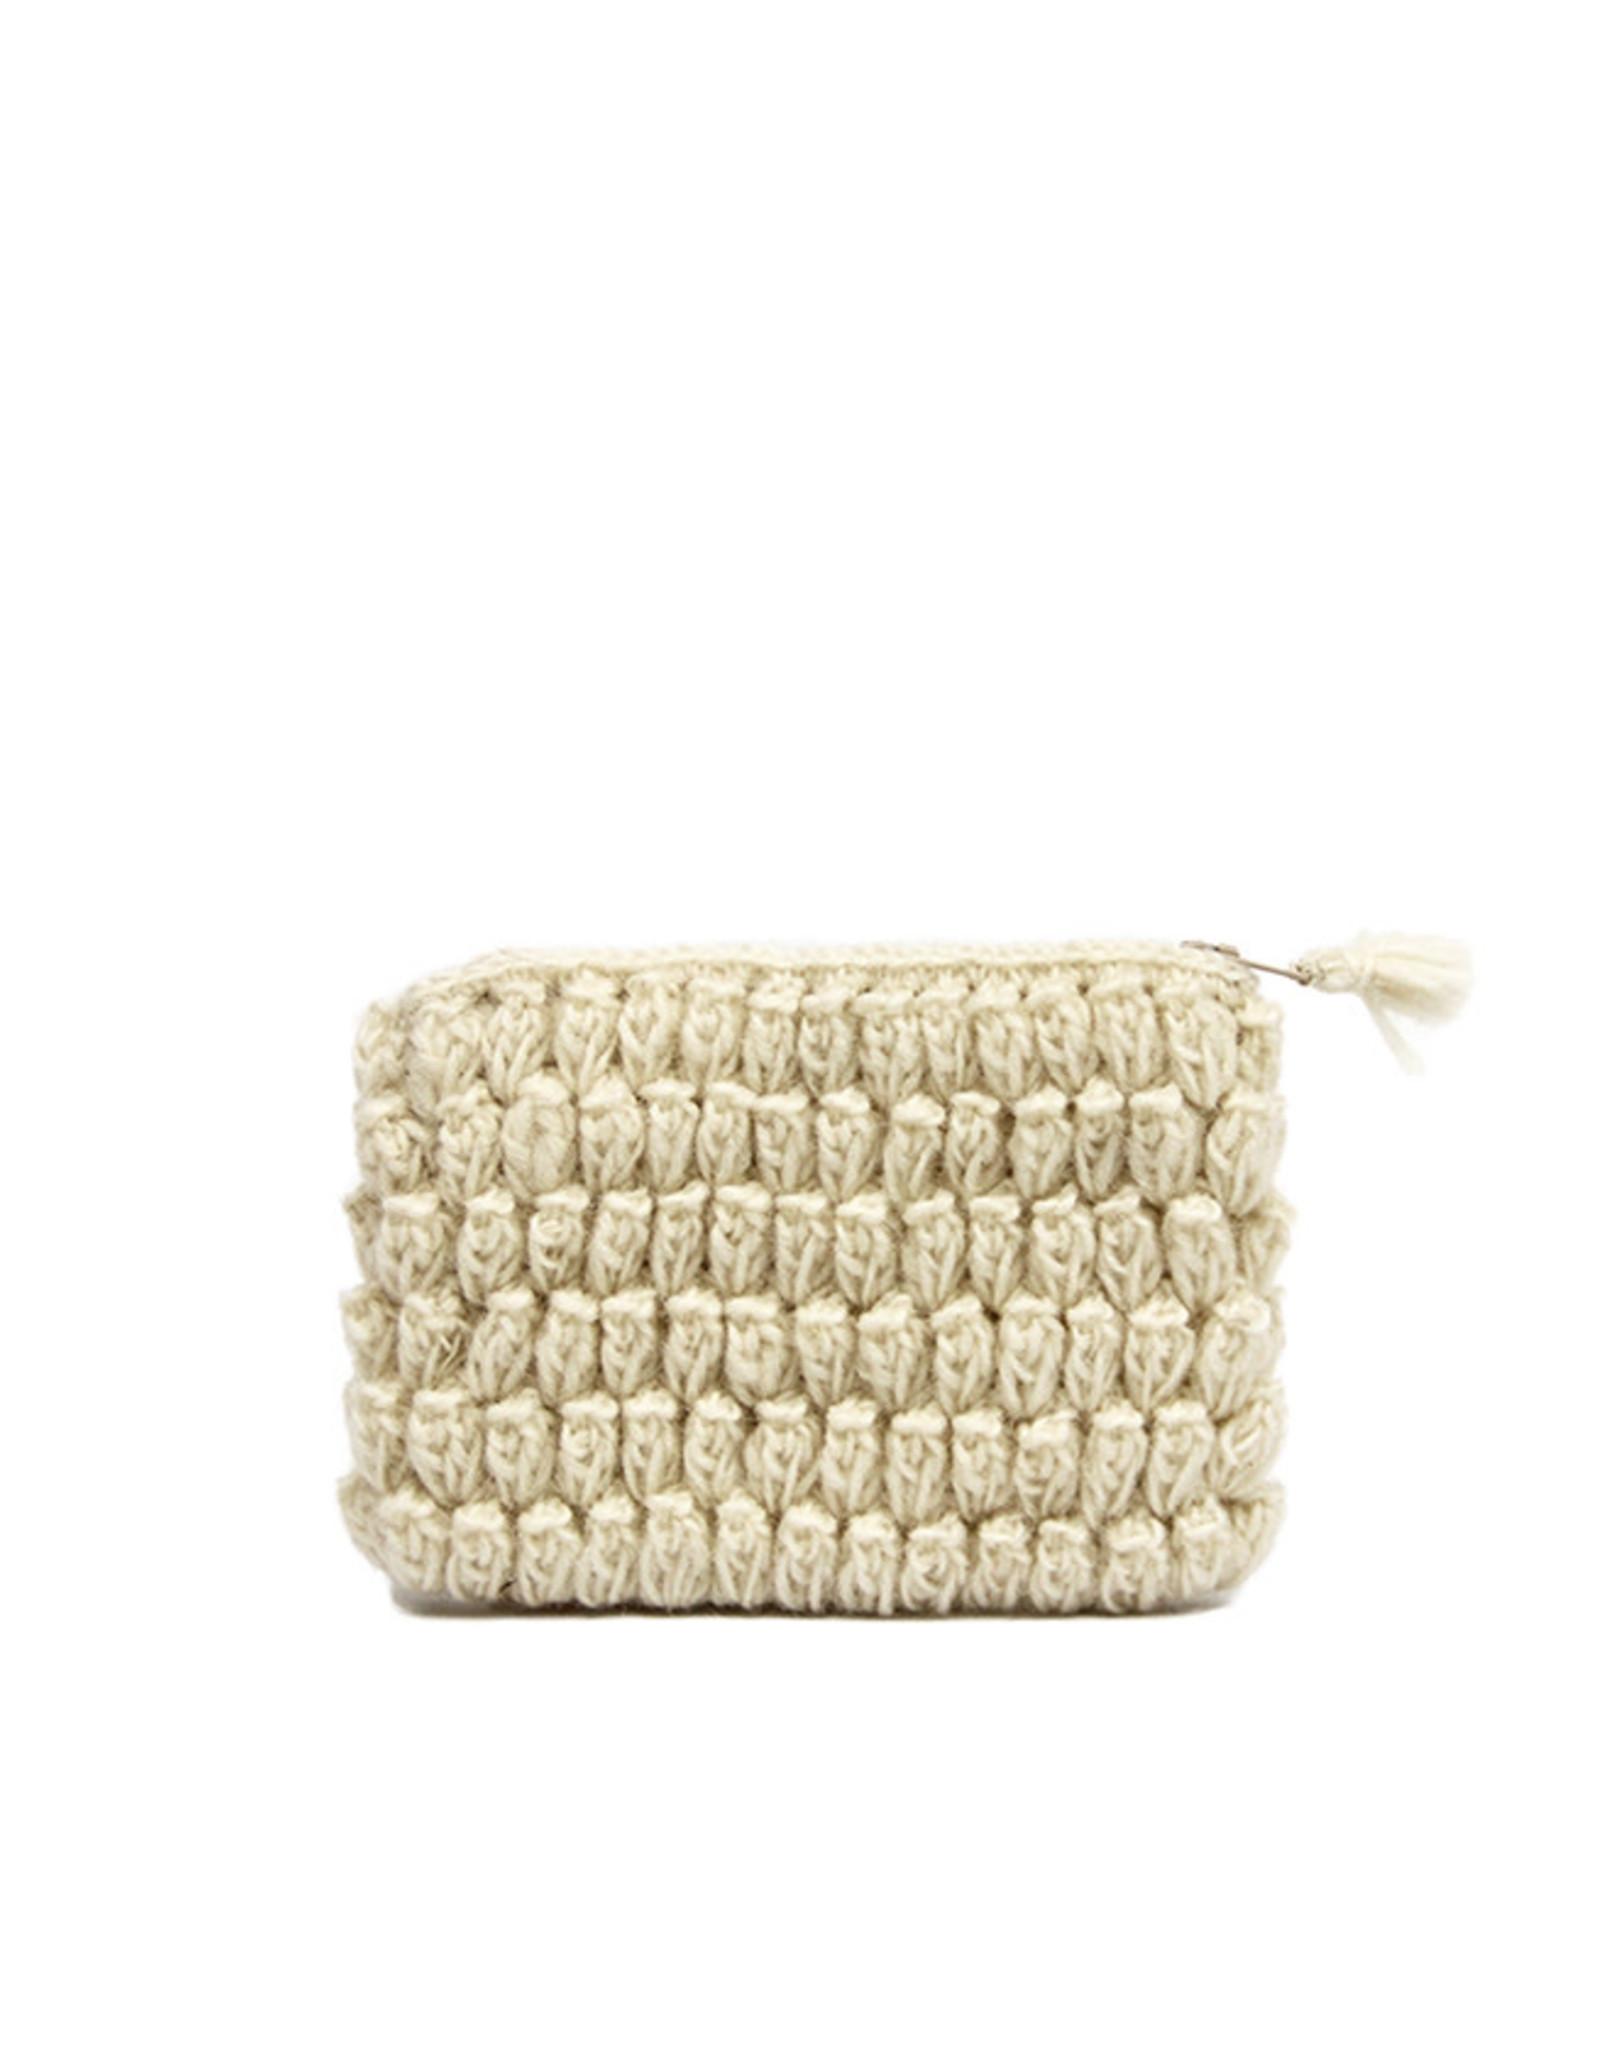 Anna Nera Wallet Crochet S 14x10cm-white